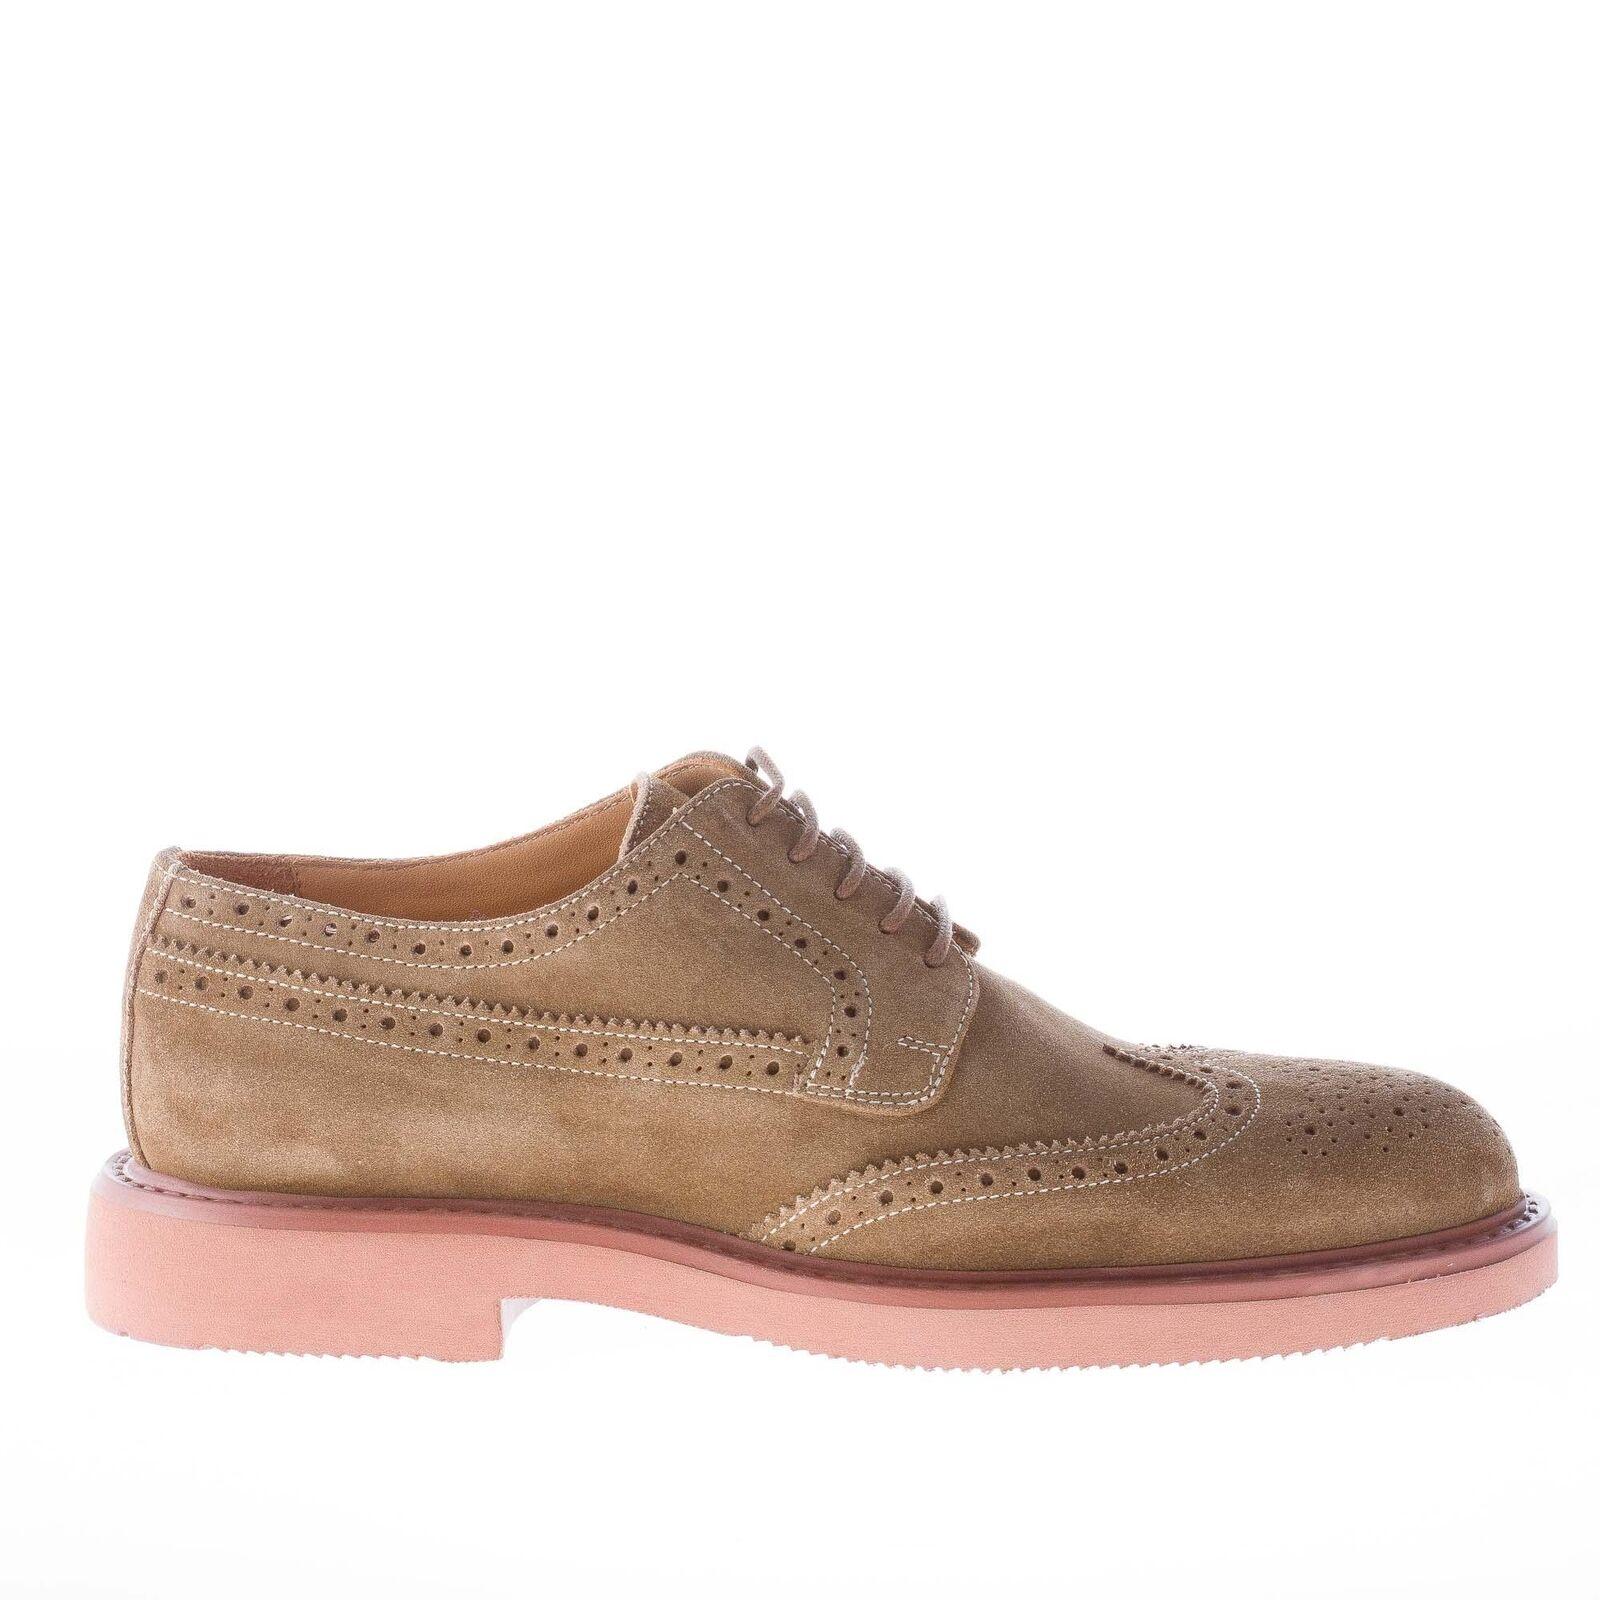 STRIKE FIRENZE men shoes brown suede lace derby wingtip brogue lightweight sole